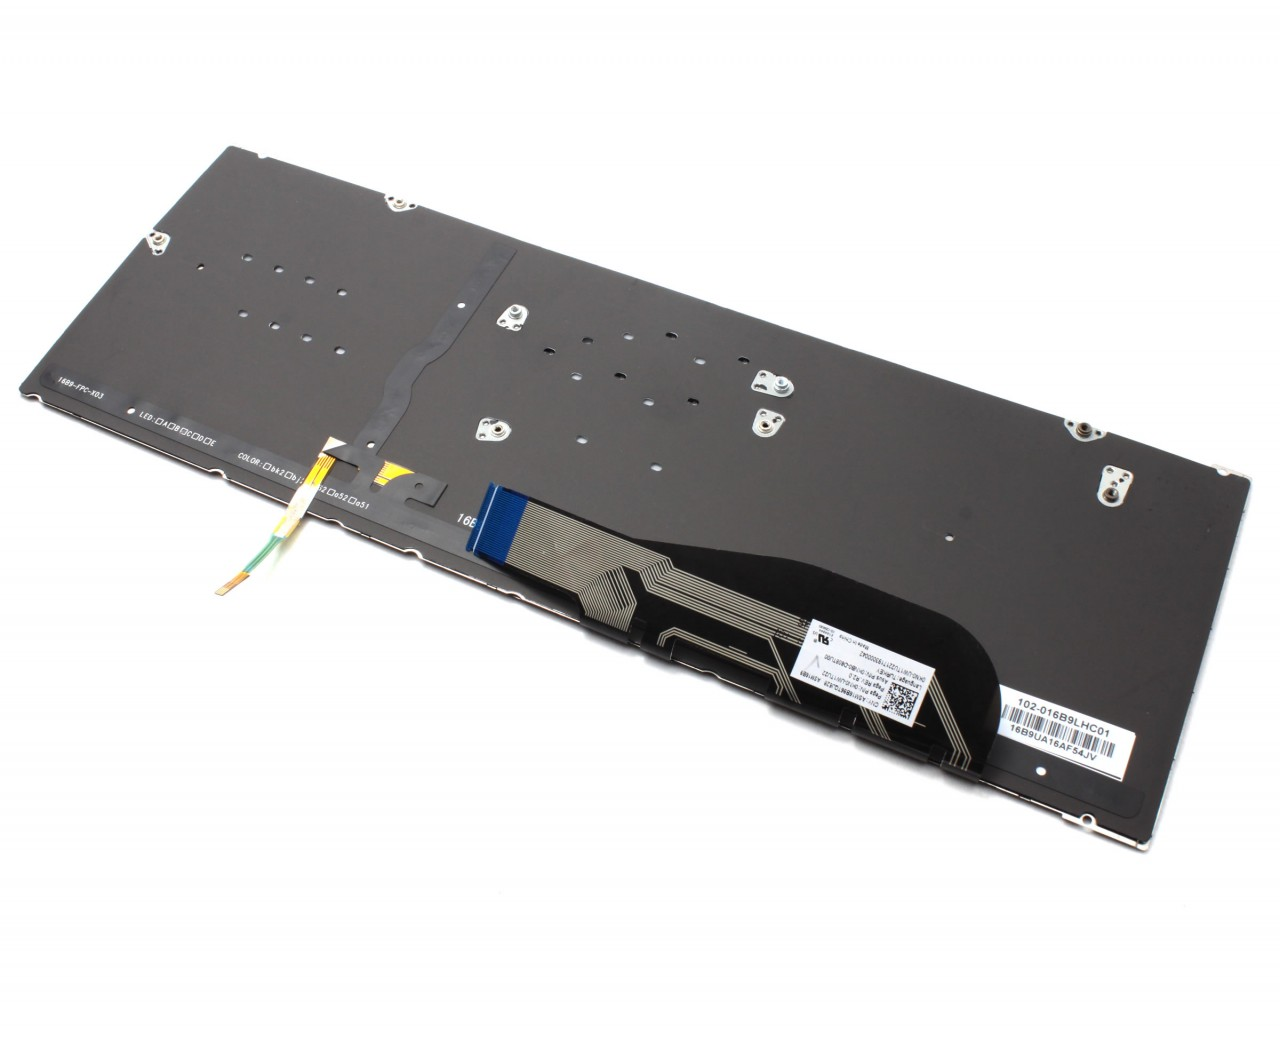 Tastatura Dark Blue Asus 0KN0-UW1TU22 iluminata layout TR UK fara rama enter mare imagine powerlaptop.ro 2021